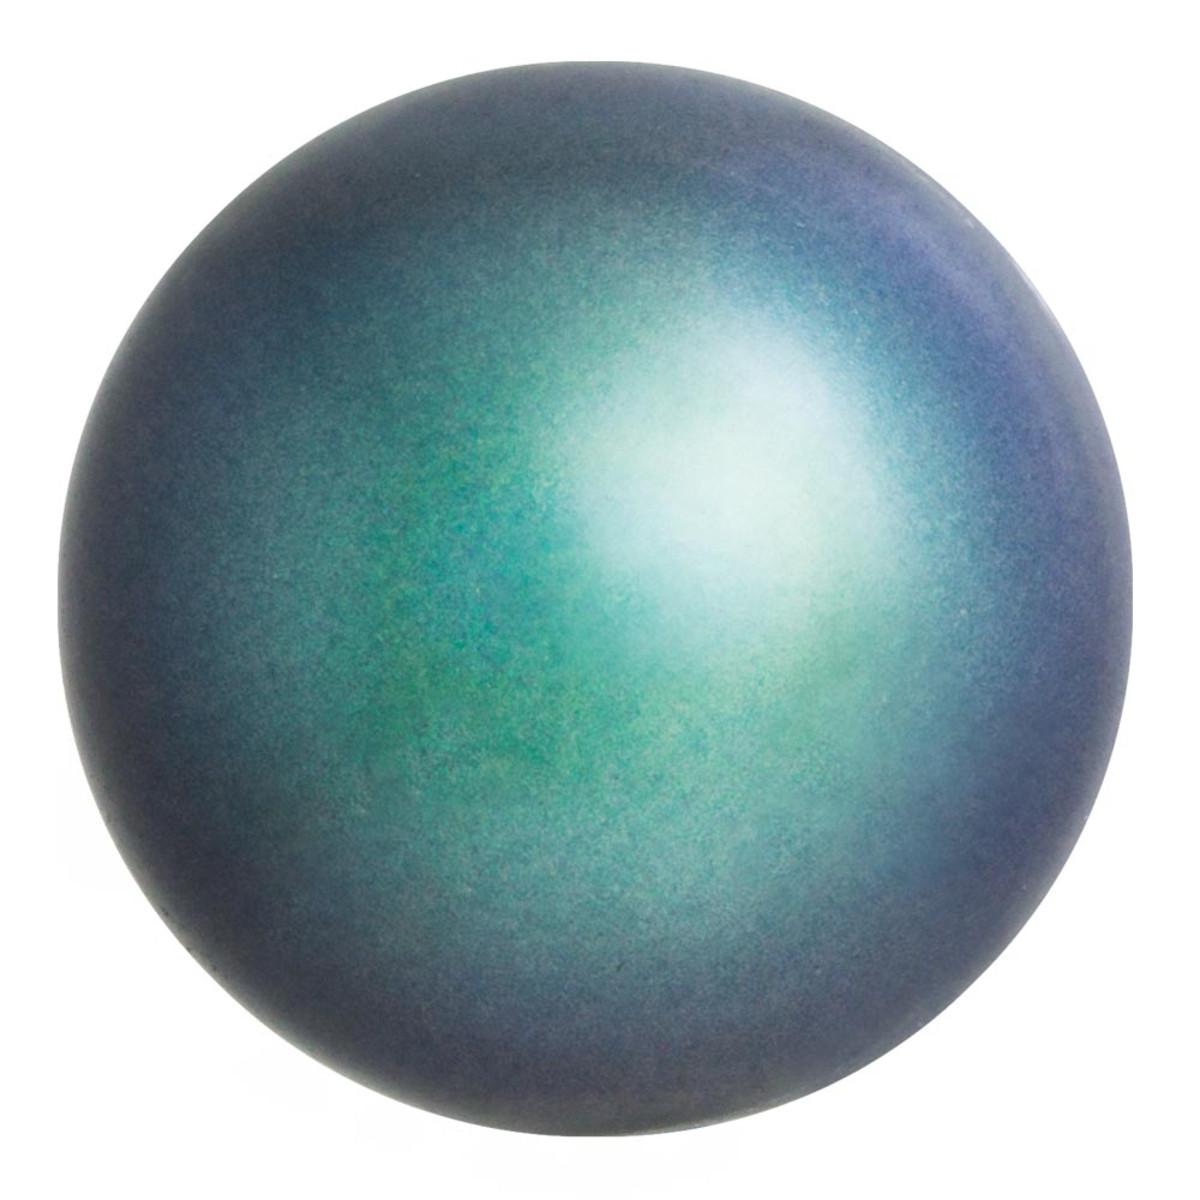 Swarovski Elements Perlen Crystal Pearls 3mm Iridescent Tahitian Look Pearls 100 Stück